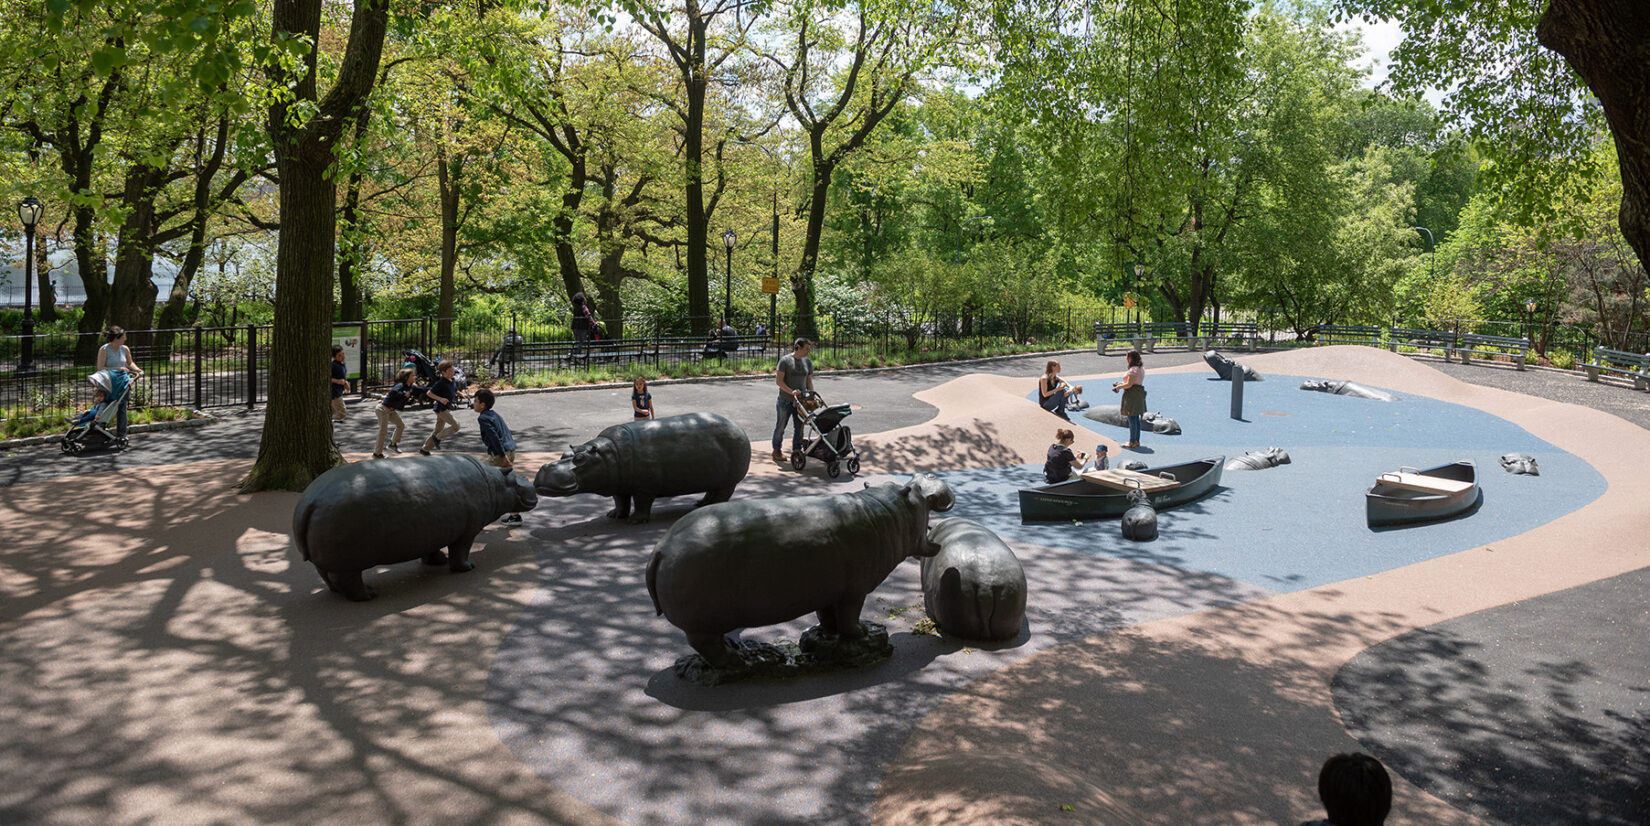 Safari Playground restoration 2019